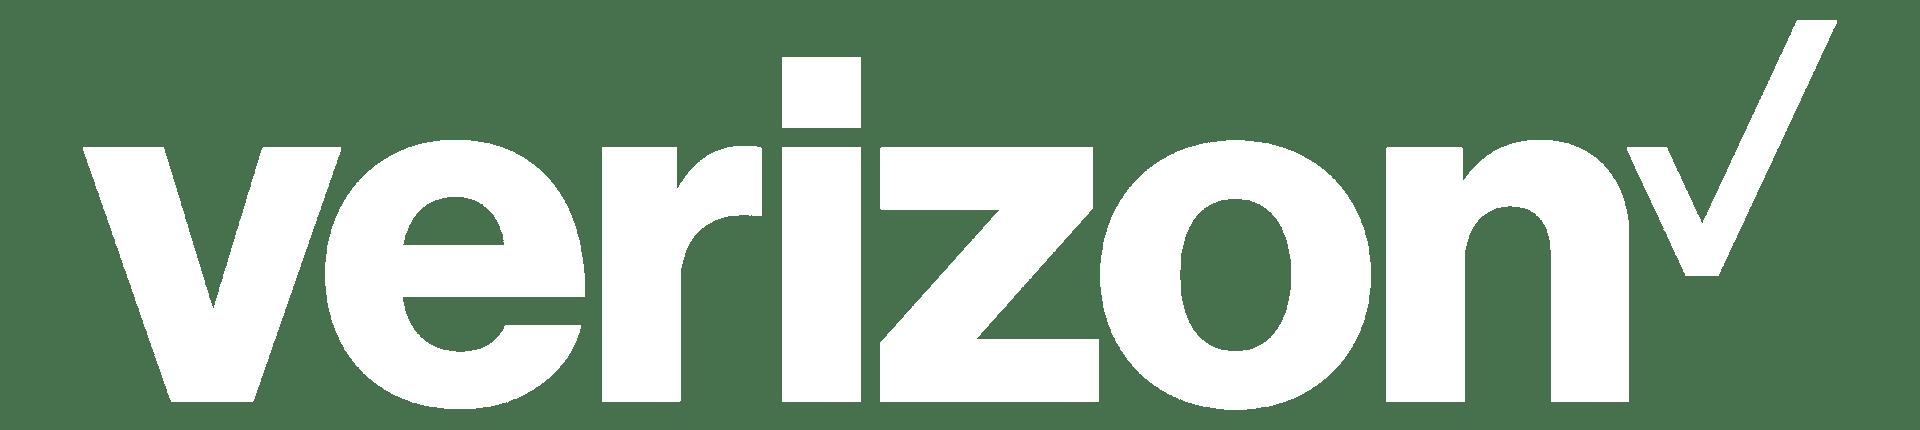 verizon-logo-transparent